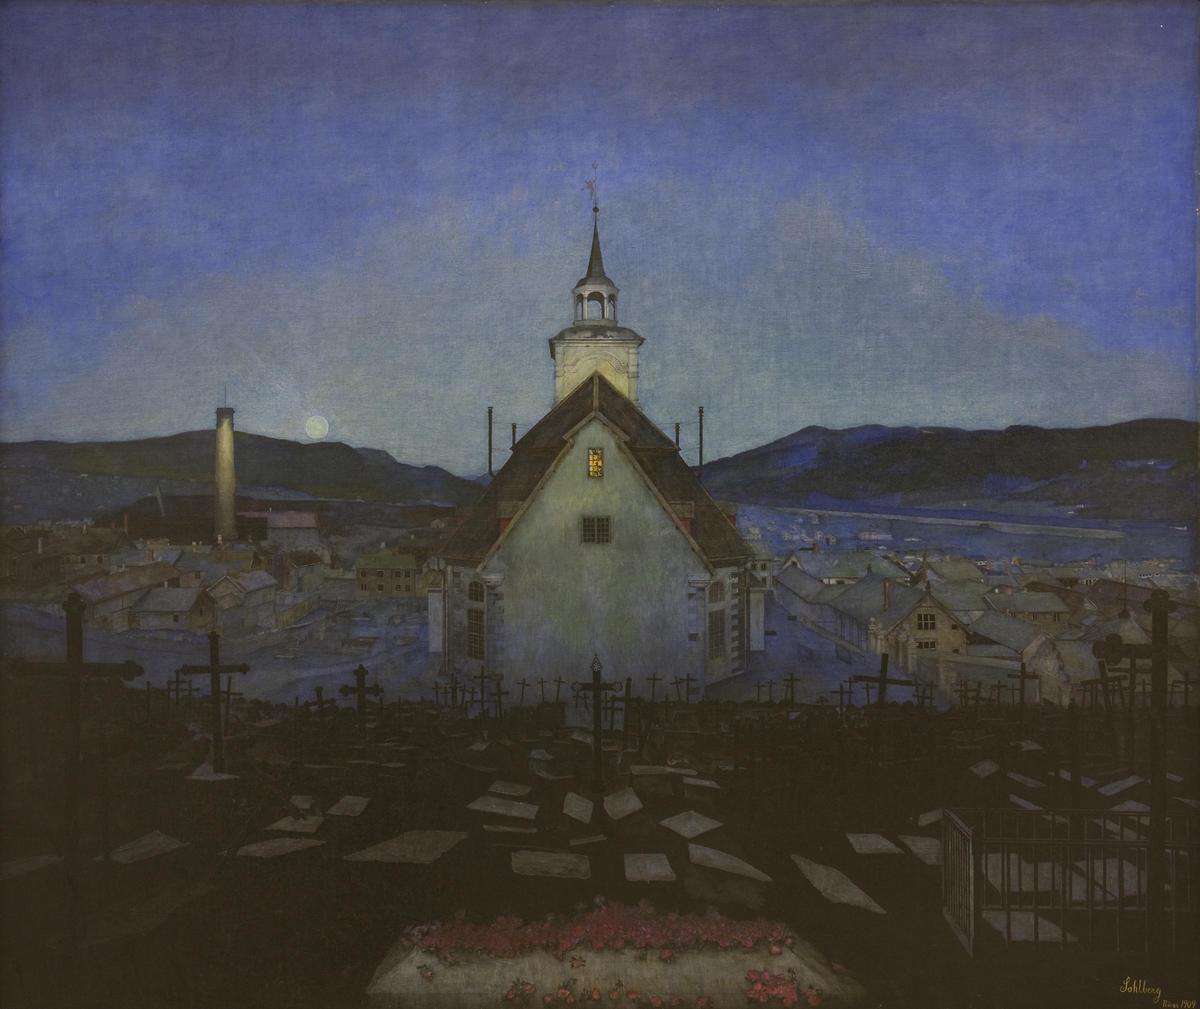 Harald Sohlberg, Natt (Røros Kirke), 1904. Trondheim kunstmuseum.